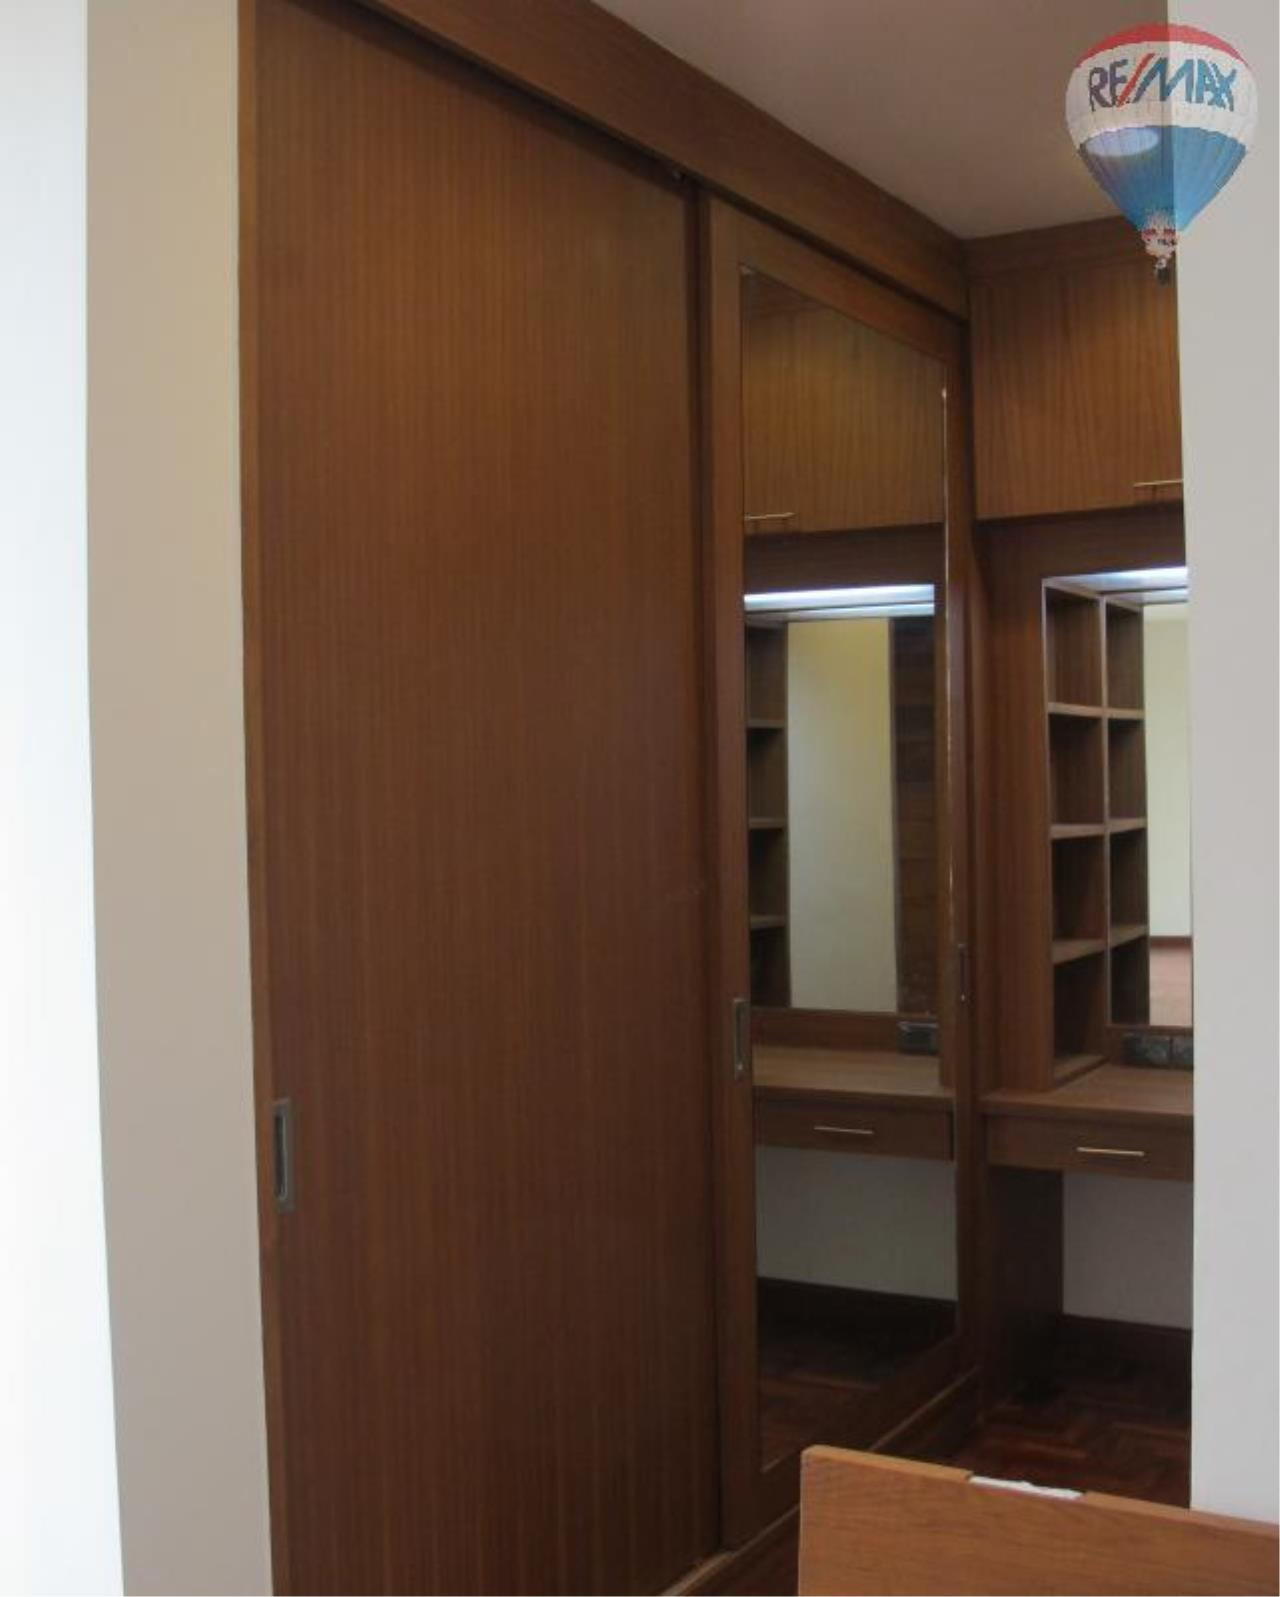 RE/MAX Properties Agency's 5 Bedroom 600 sq.m. for Rent in Sukhumvit 24 7